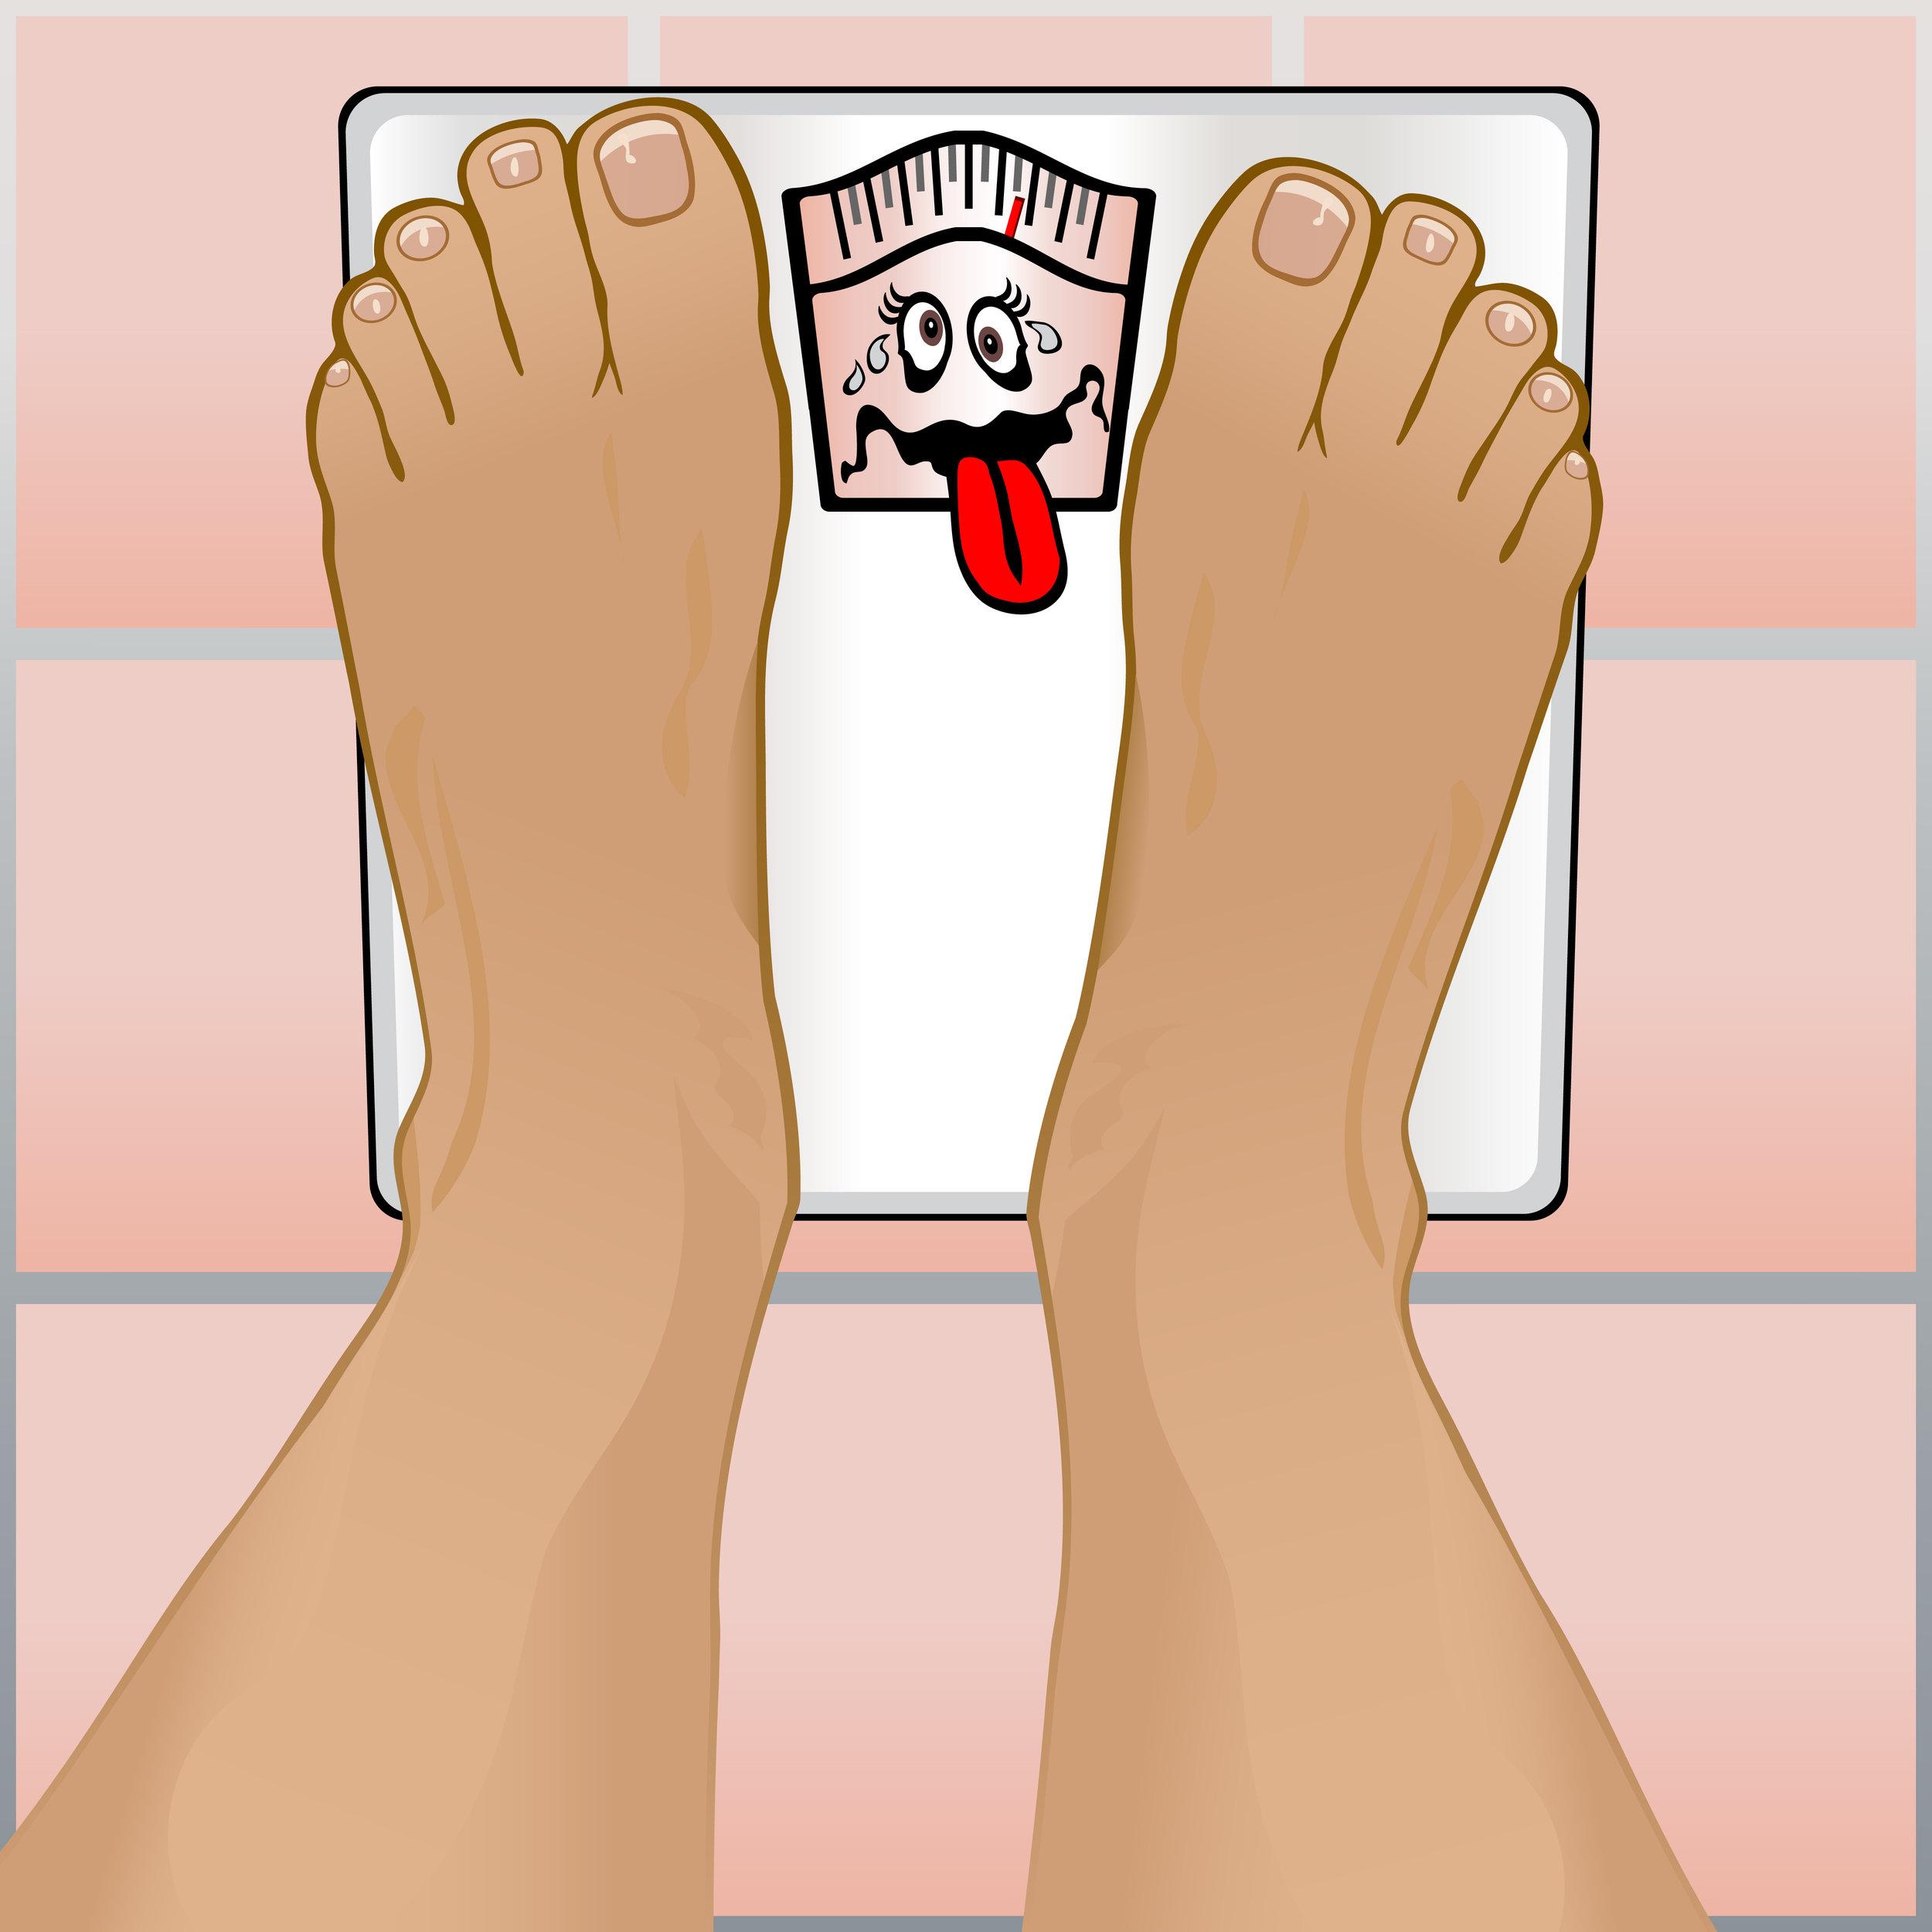 bodyweight scale.jpg